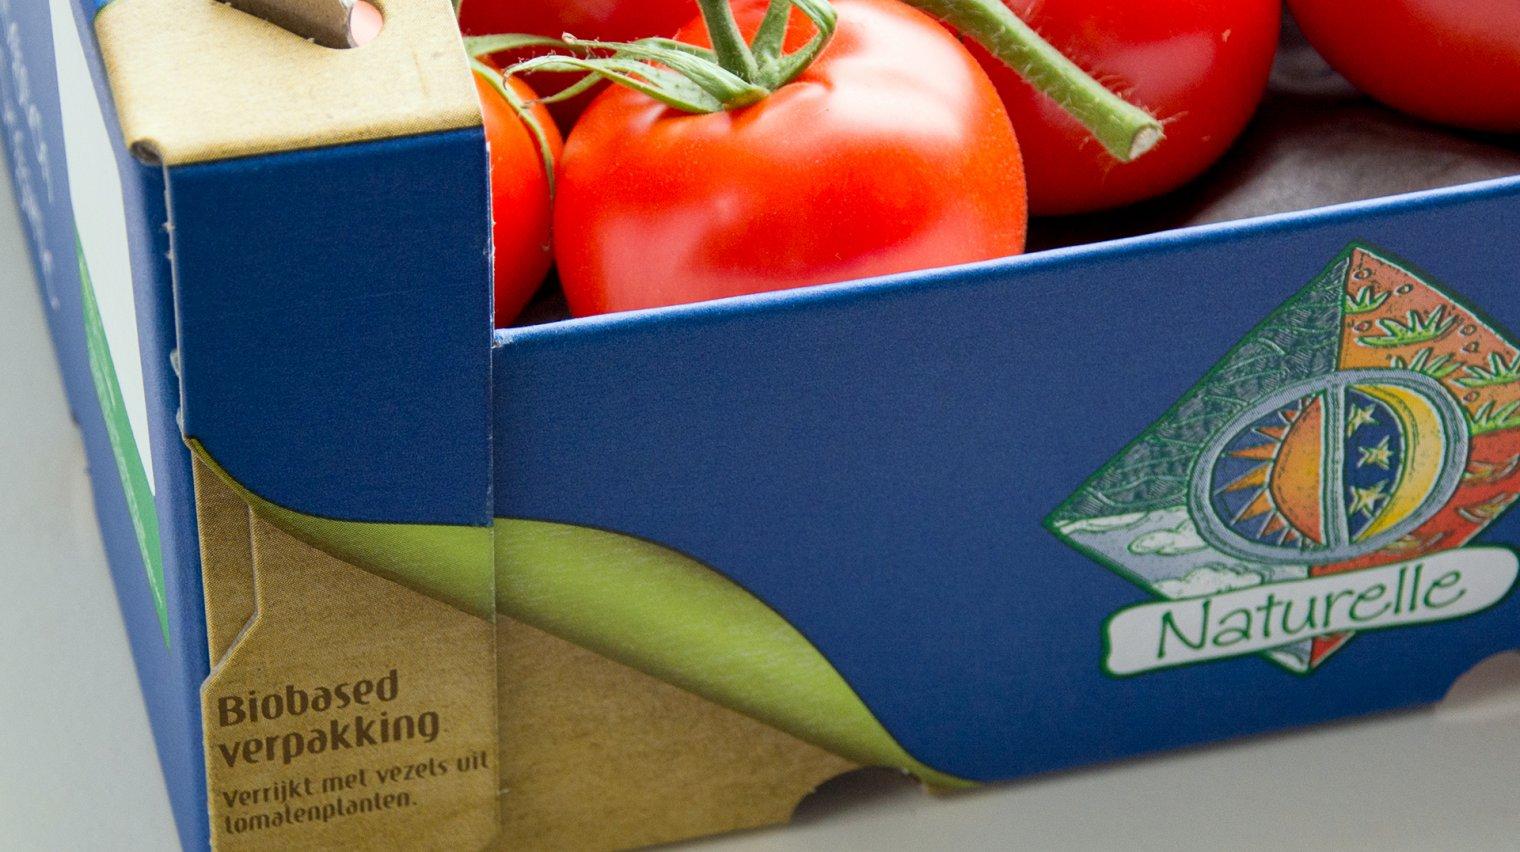 naturelle bio based verpakking